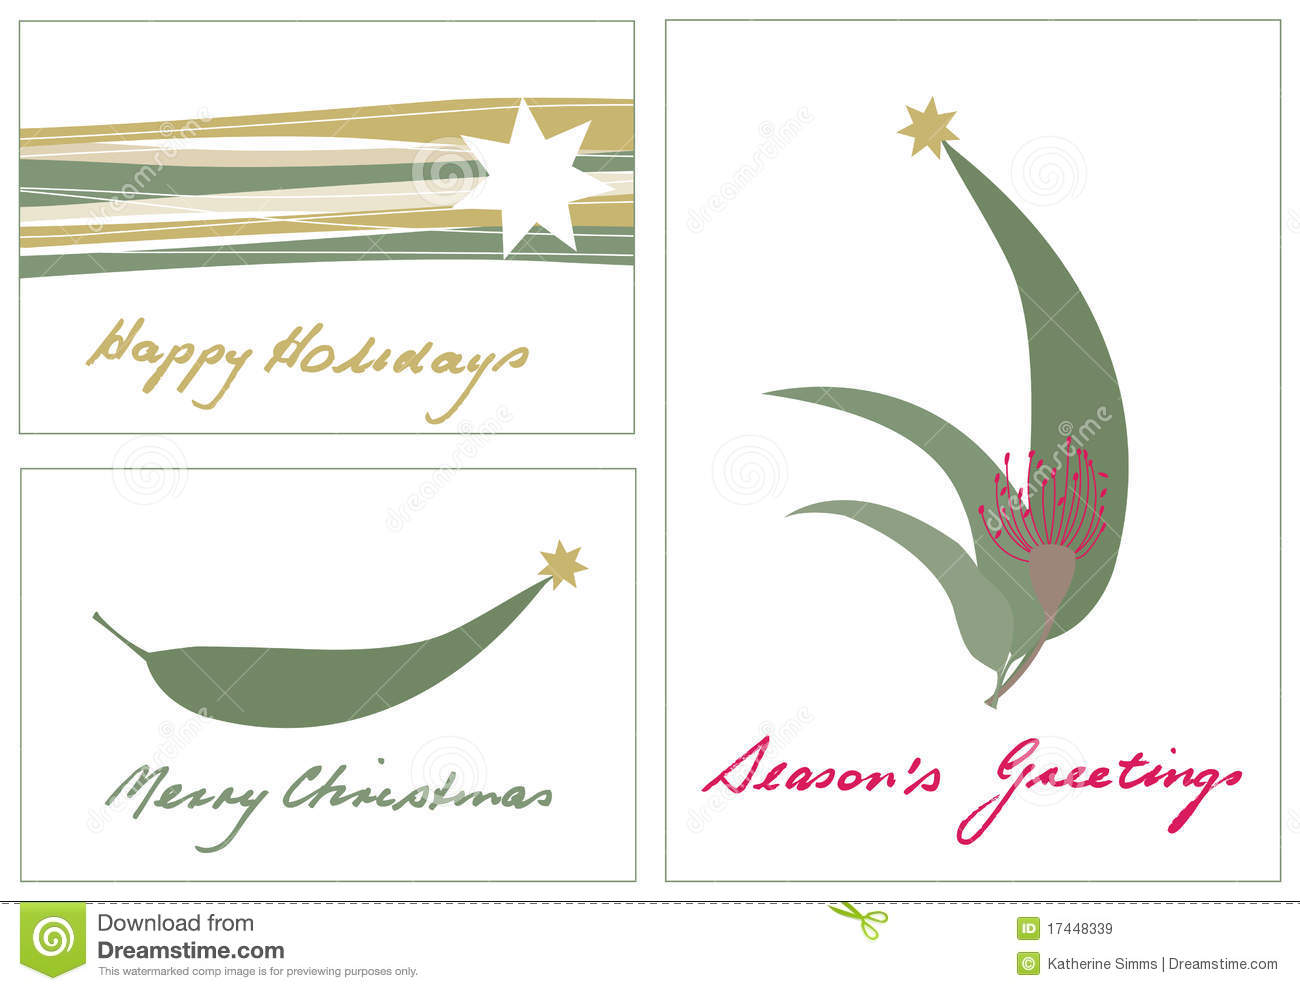 Australian Christmas stock vector. Illustration of happy.